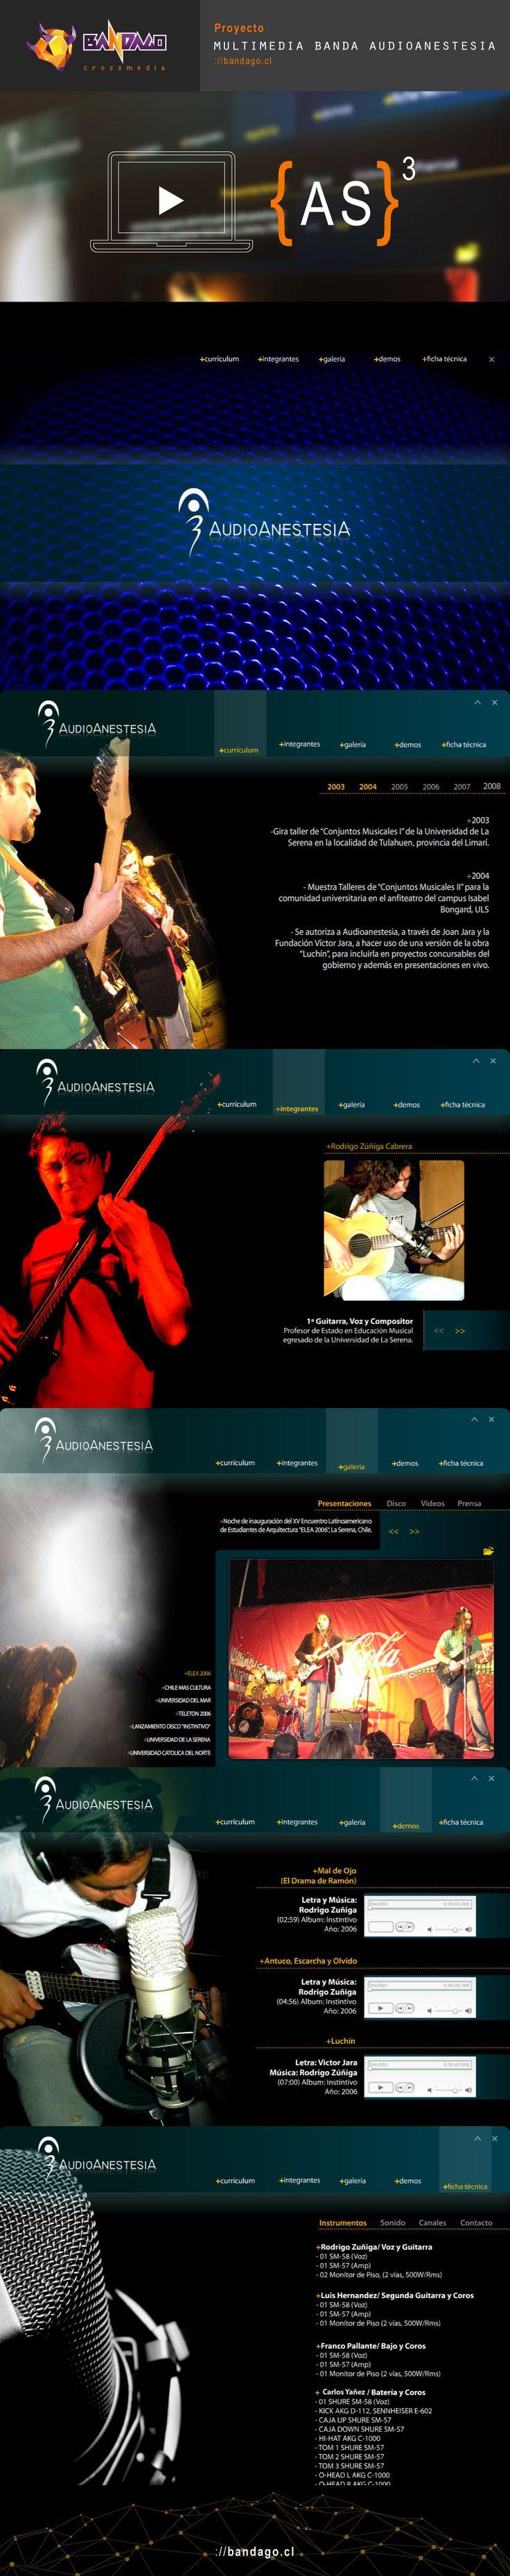 #multimedia #flash #bio #diseño #laserena #audioanestesia #bandago. Más info: http://bandago.cl/lens_portfolio/multimedia-audioanestesia/